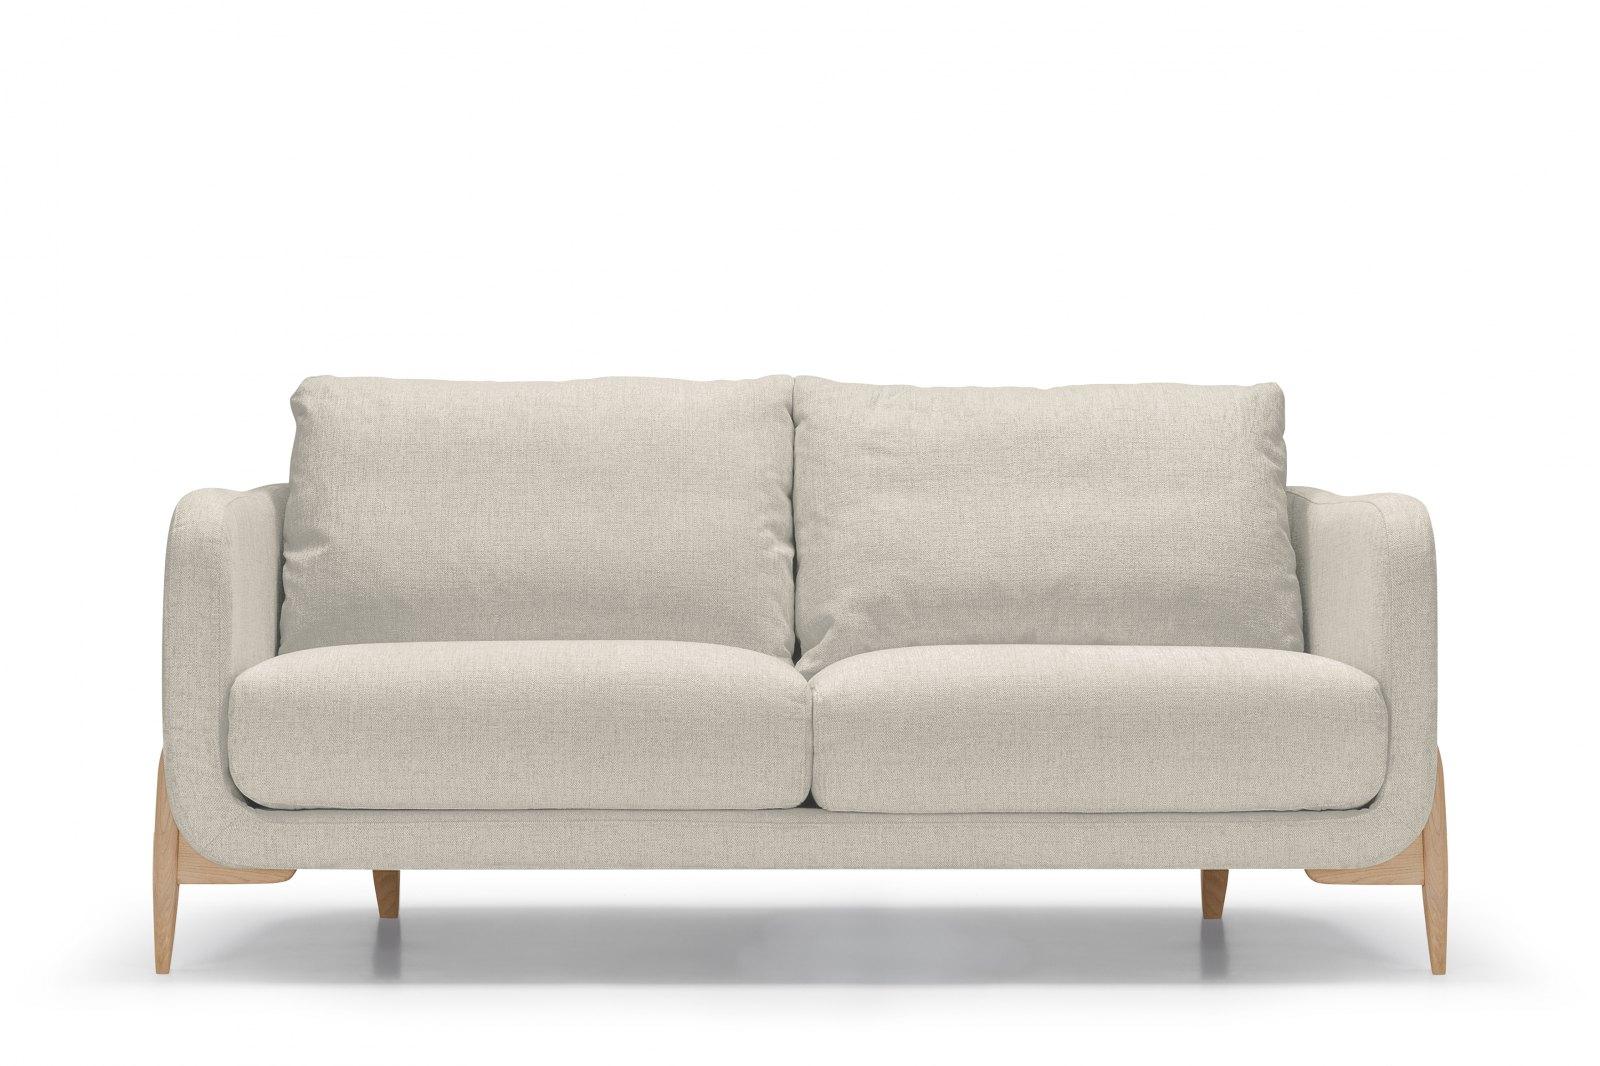 Janson 2 Seater Linen Sofa / 1